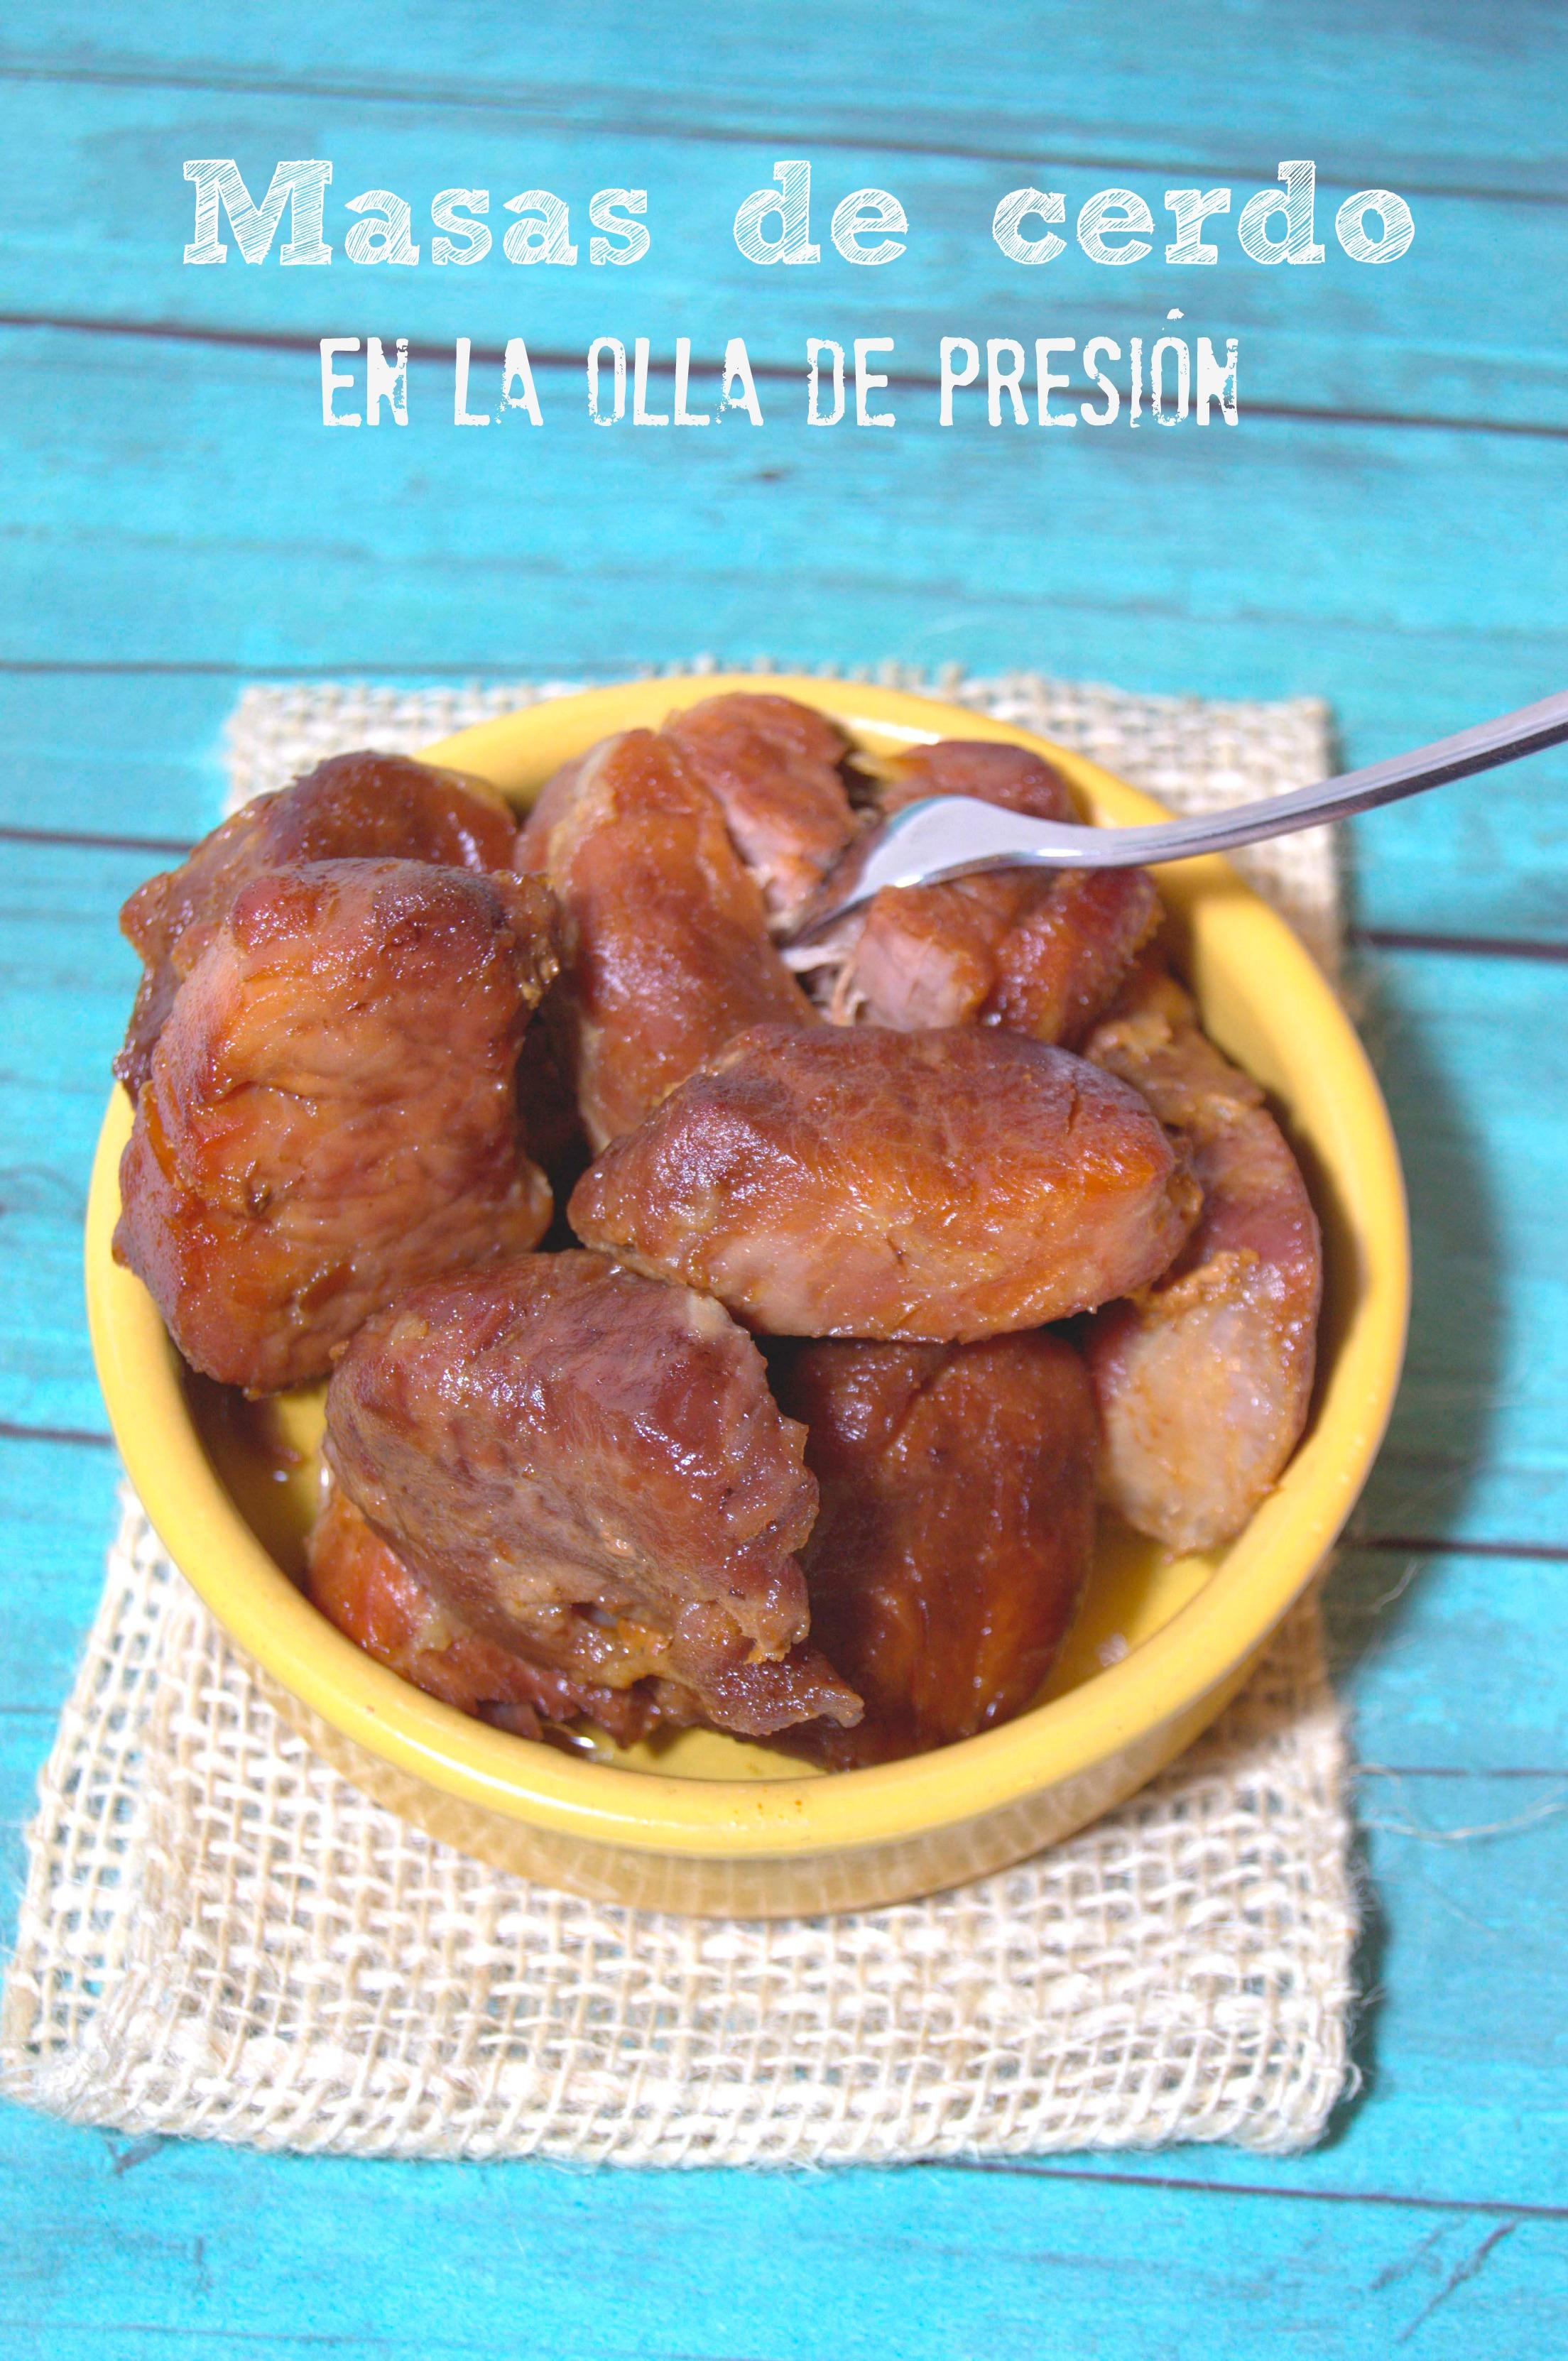 Manitas de cerdo en salsa olla gm d - Receta Petitchef